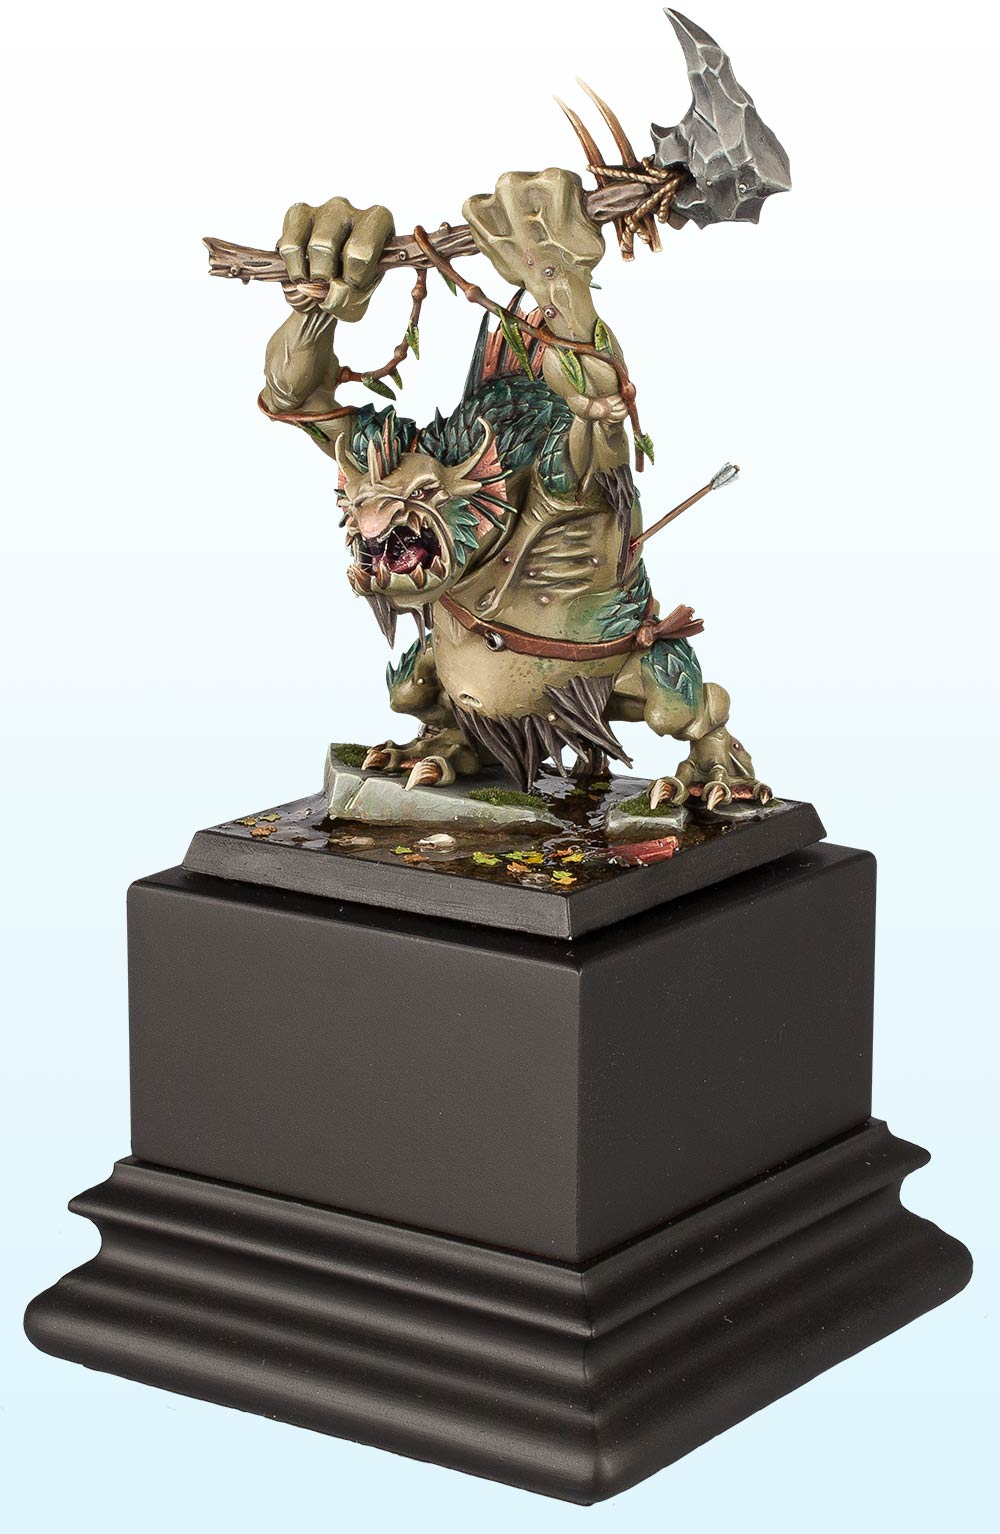 Warhammer Large Model: Bronze – 2014